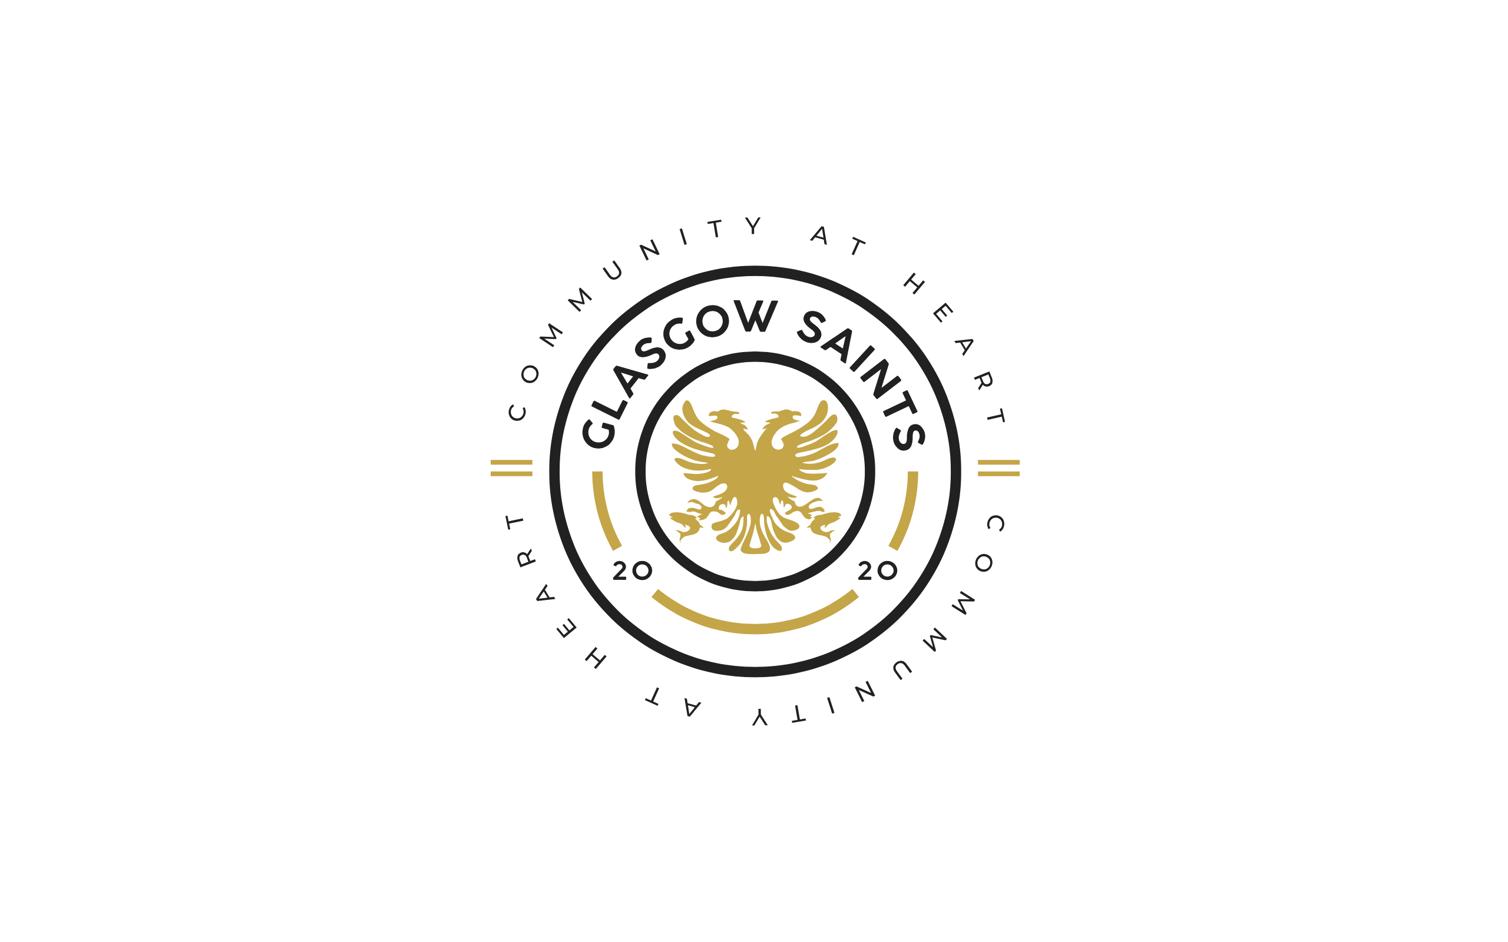 Glasgow Saints Home